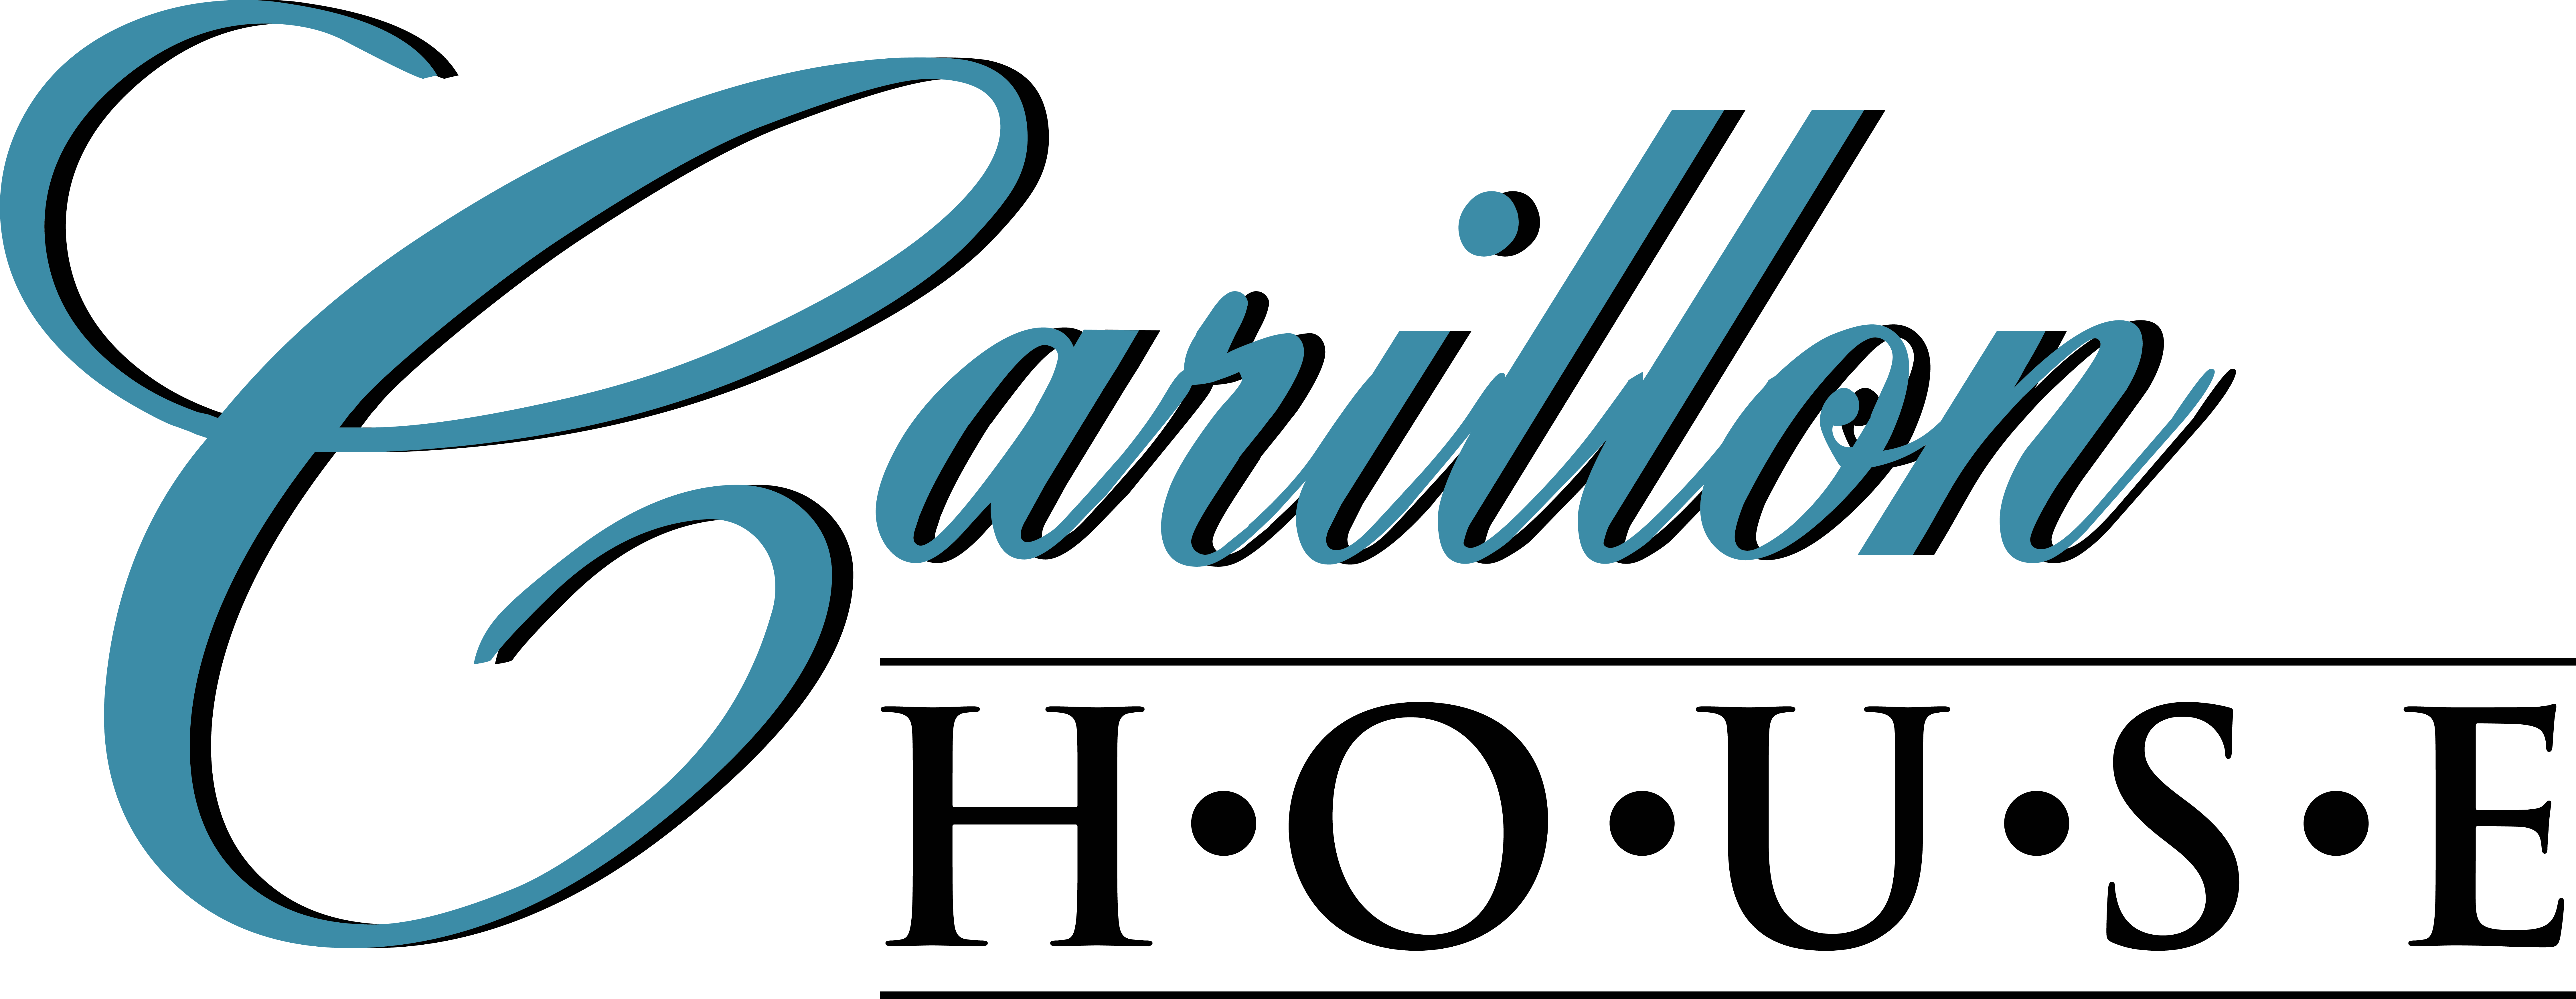 Apartments In Washington Dc Carillon House Apartments